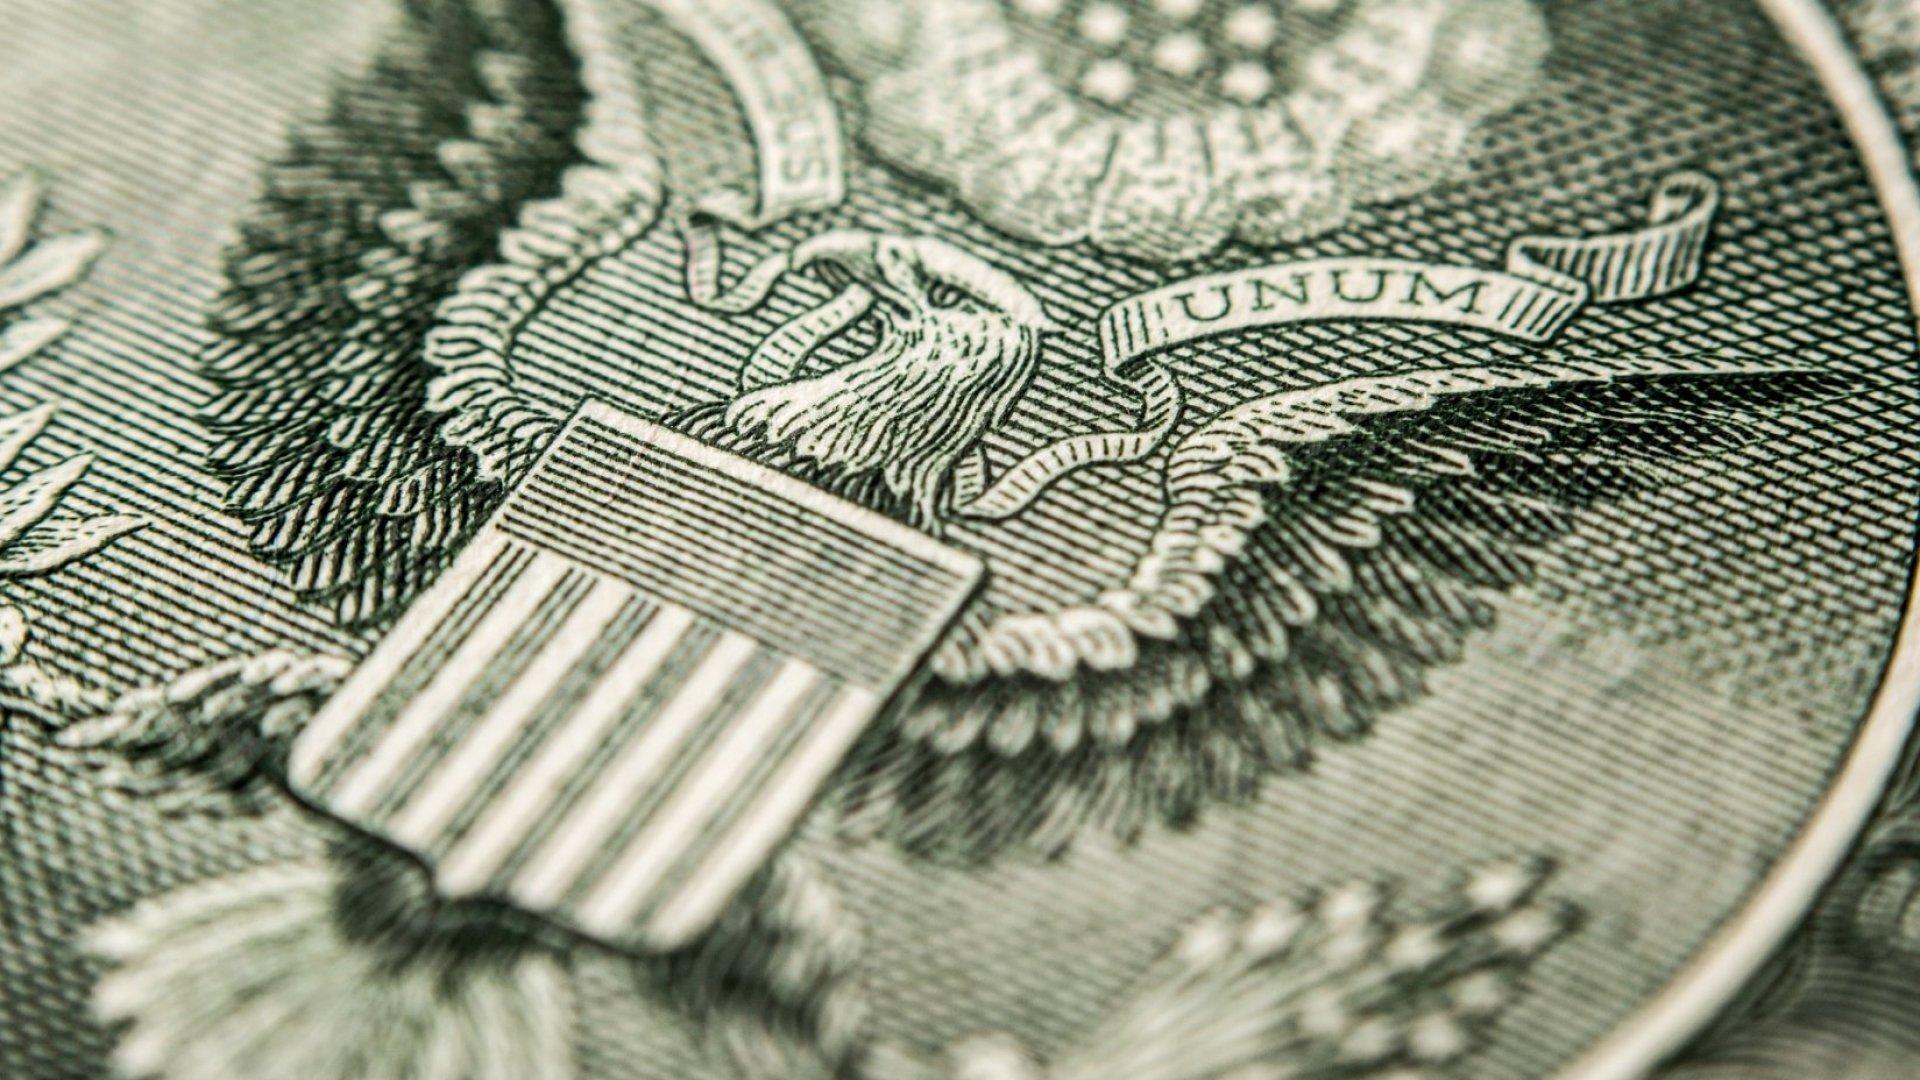 Report: U.S. Venture Funding Fell 11 Percent in 2016